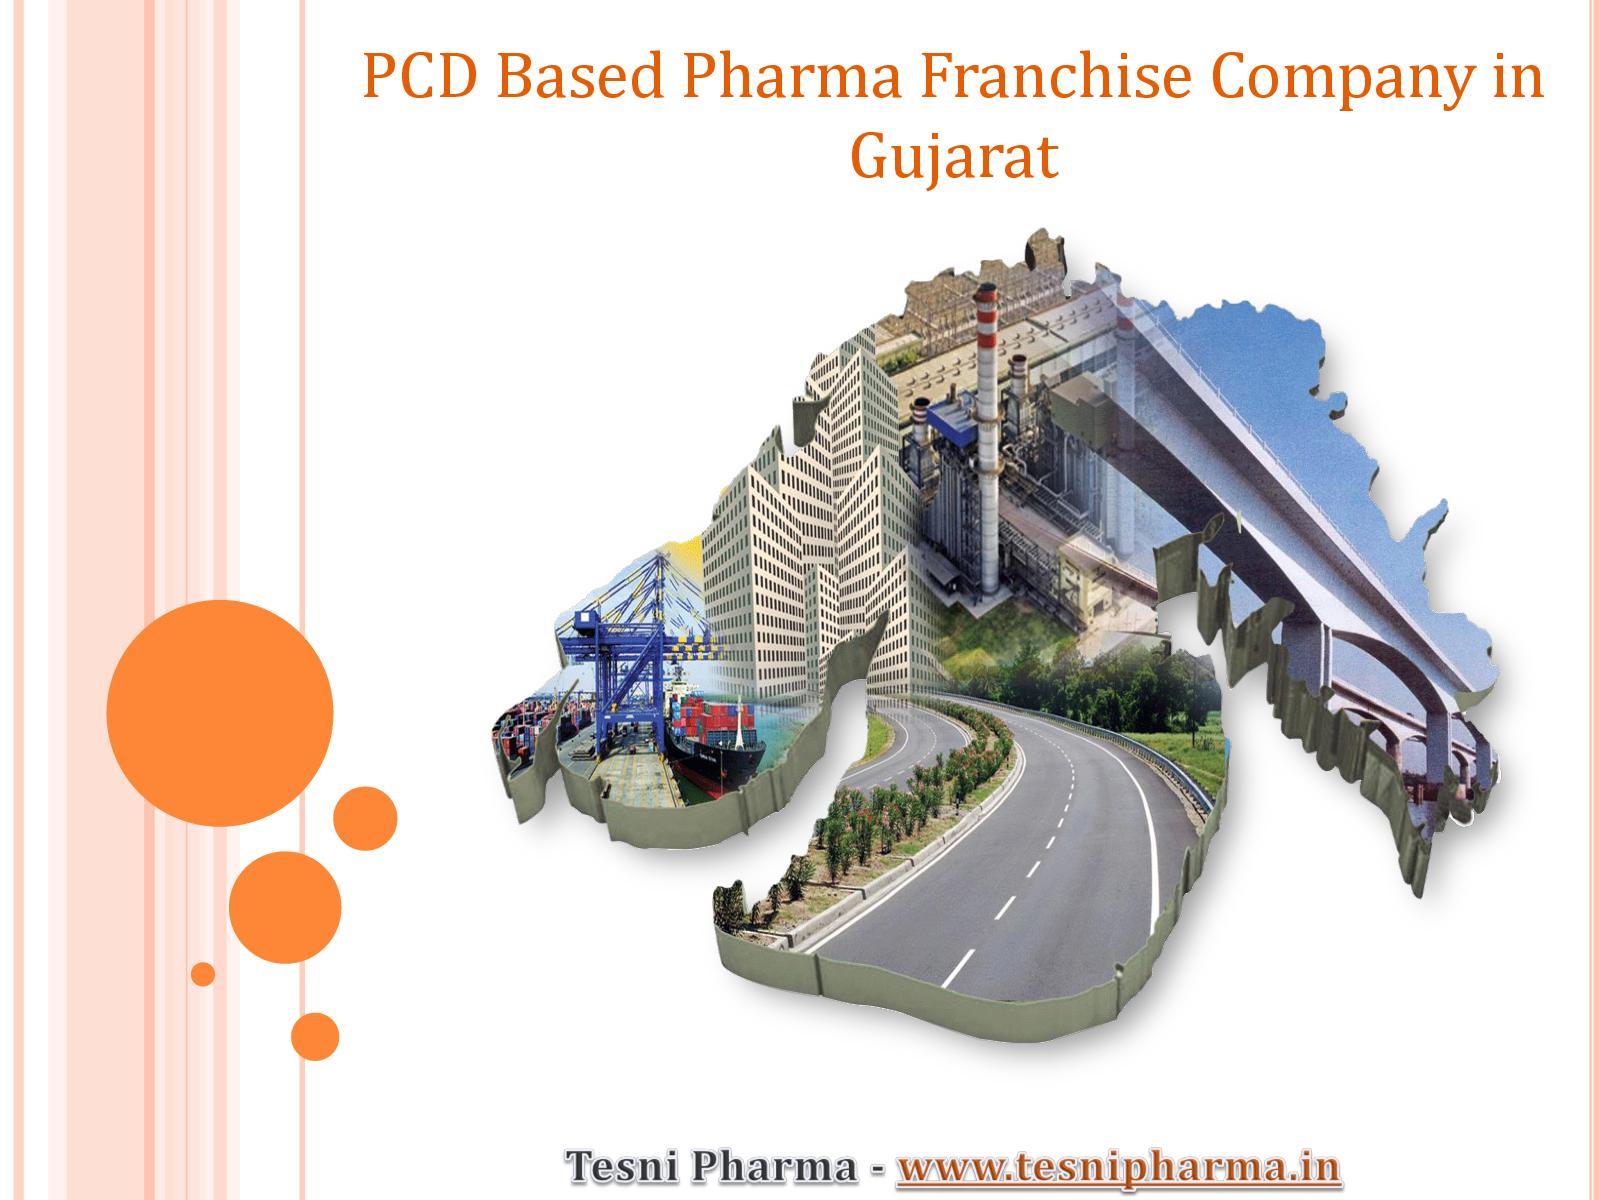 Calaméo - Pcd Based Pharma Franchise Company In Gujarat